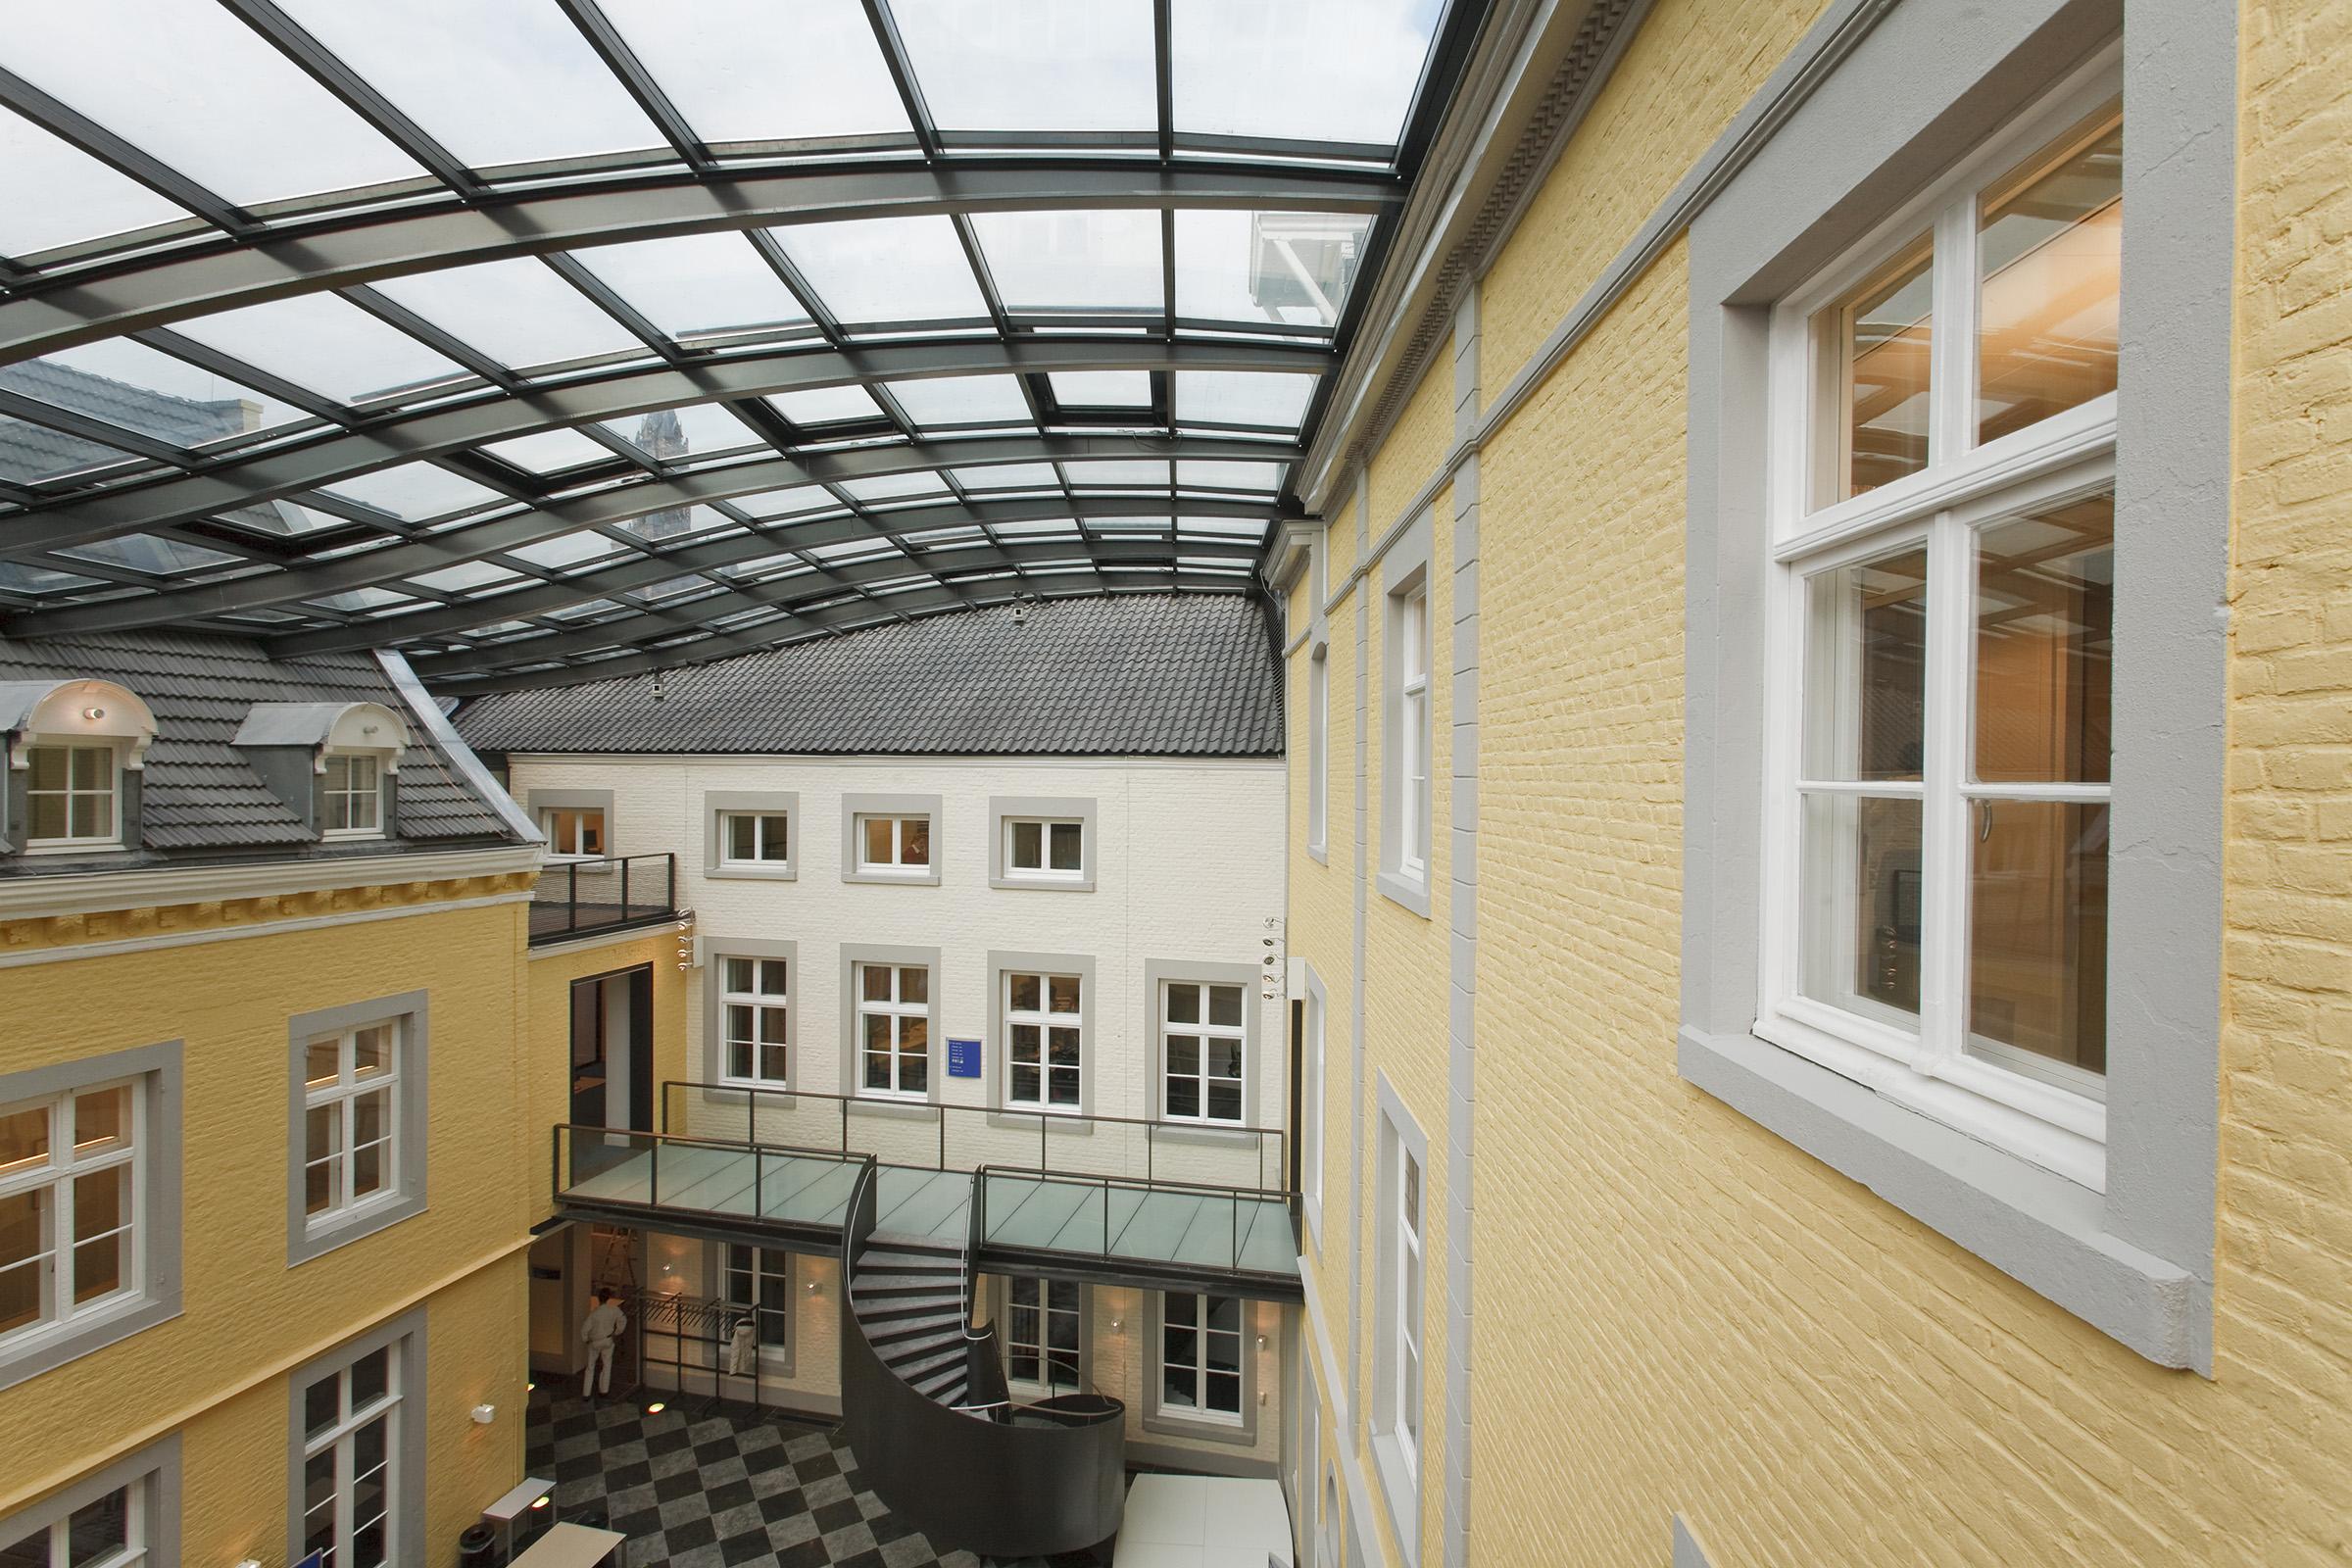 Maastricht University: Graduate School of Governance